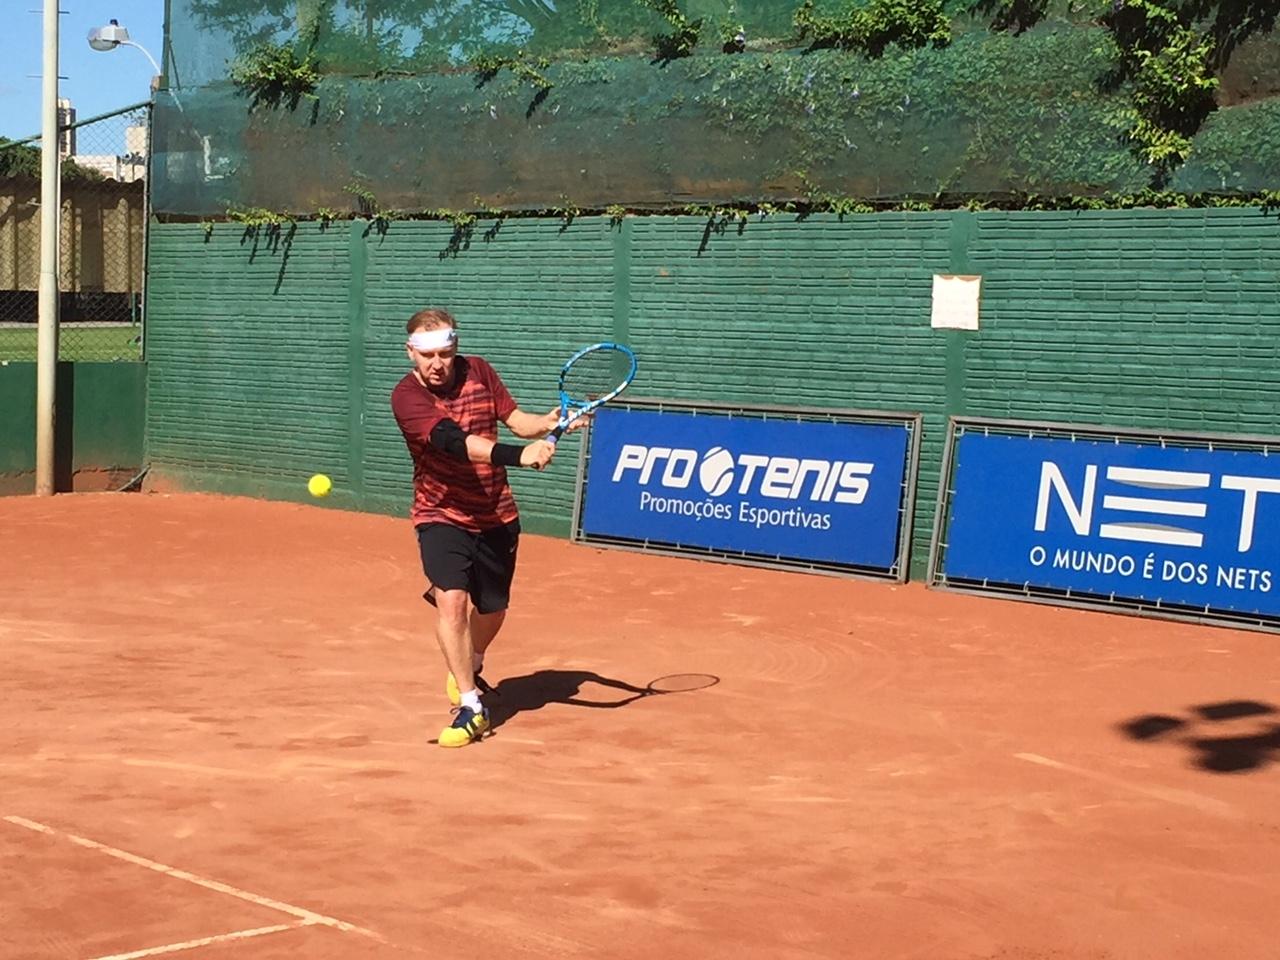 ea9b8a52f8 Tenista de Novo Hamburgo Beno Bücker Filho foi derrotado na rodada de  abertura